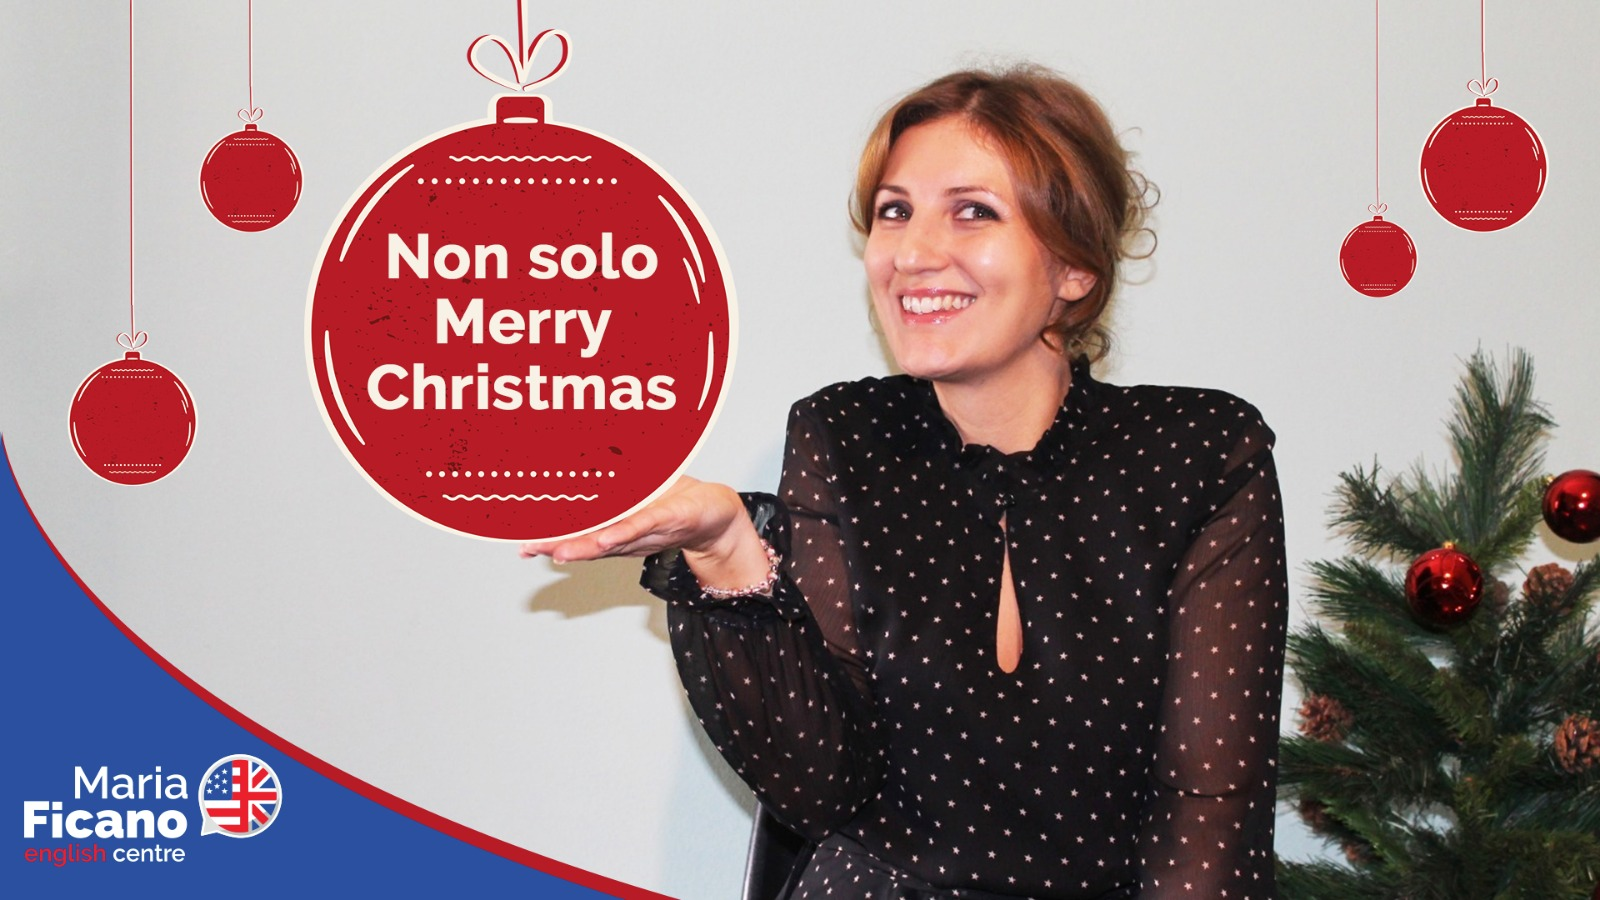 auguri, natale, buon anno, inglese, merry christmas, maria ficano